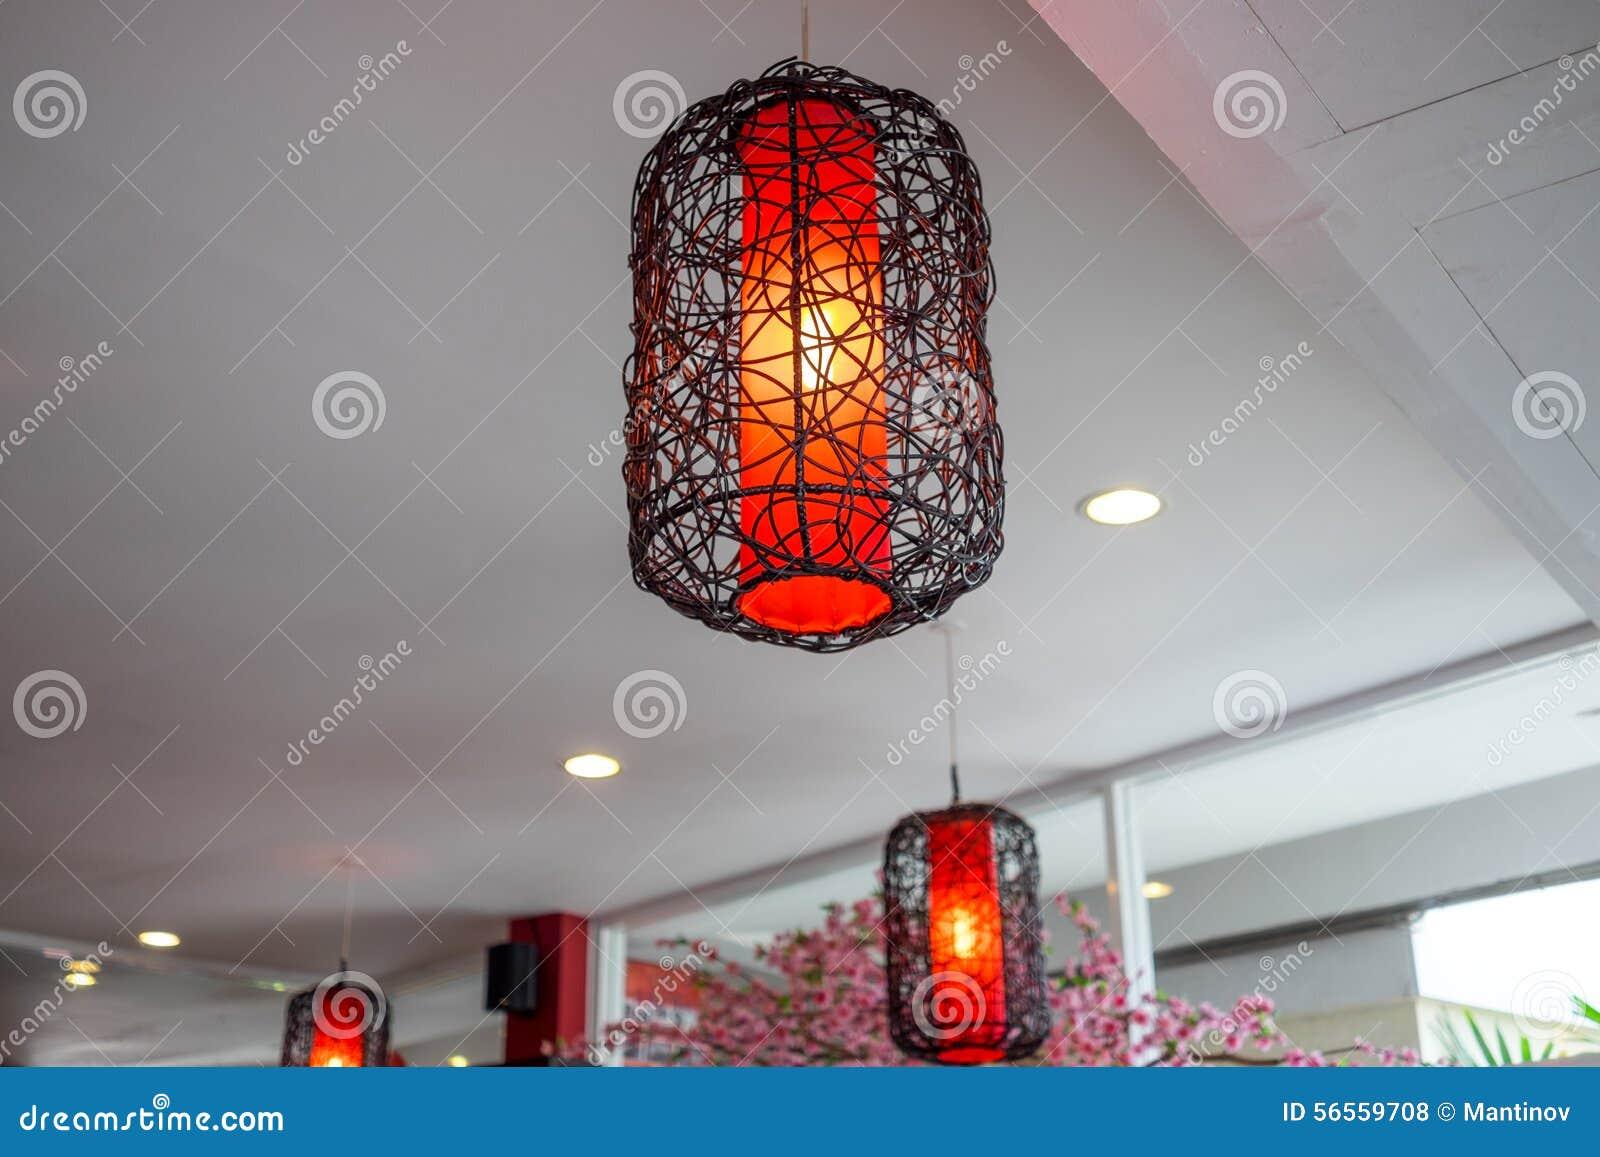 Download Όμορφα κινεζικά κρεμώντας φανάρια ύφους Στοκ Εικόνες - εικόνα από πολυτέλεια, ceiling: 56559708